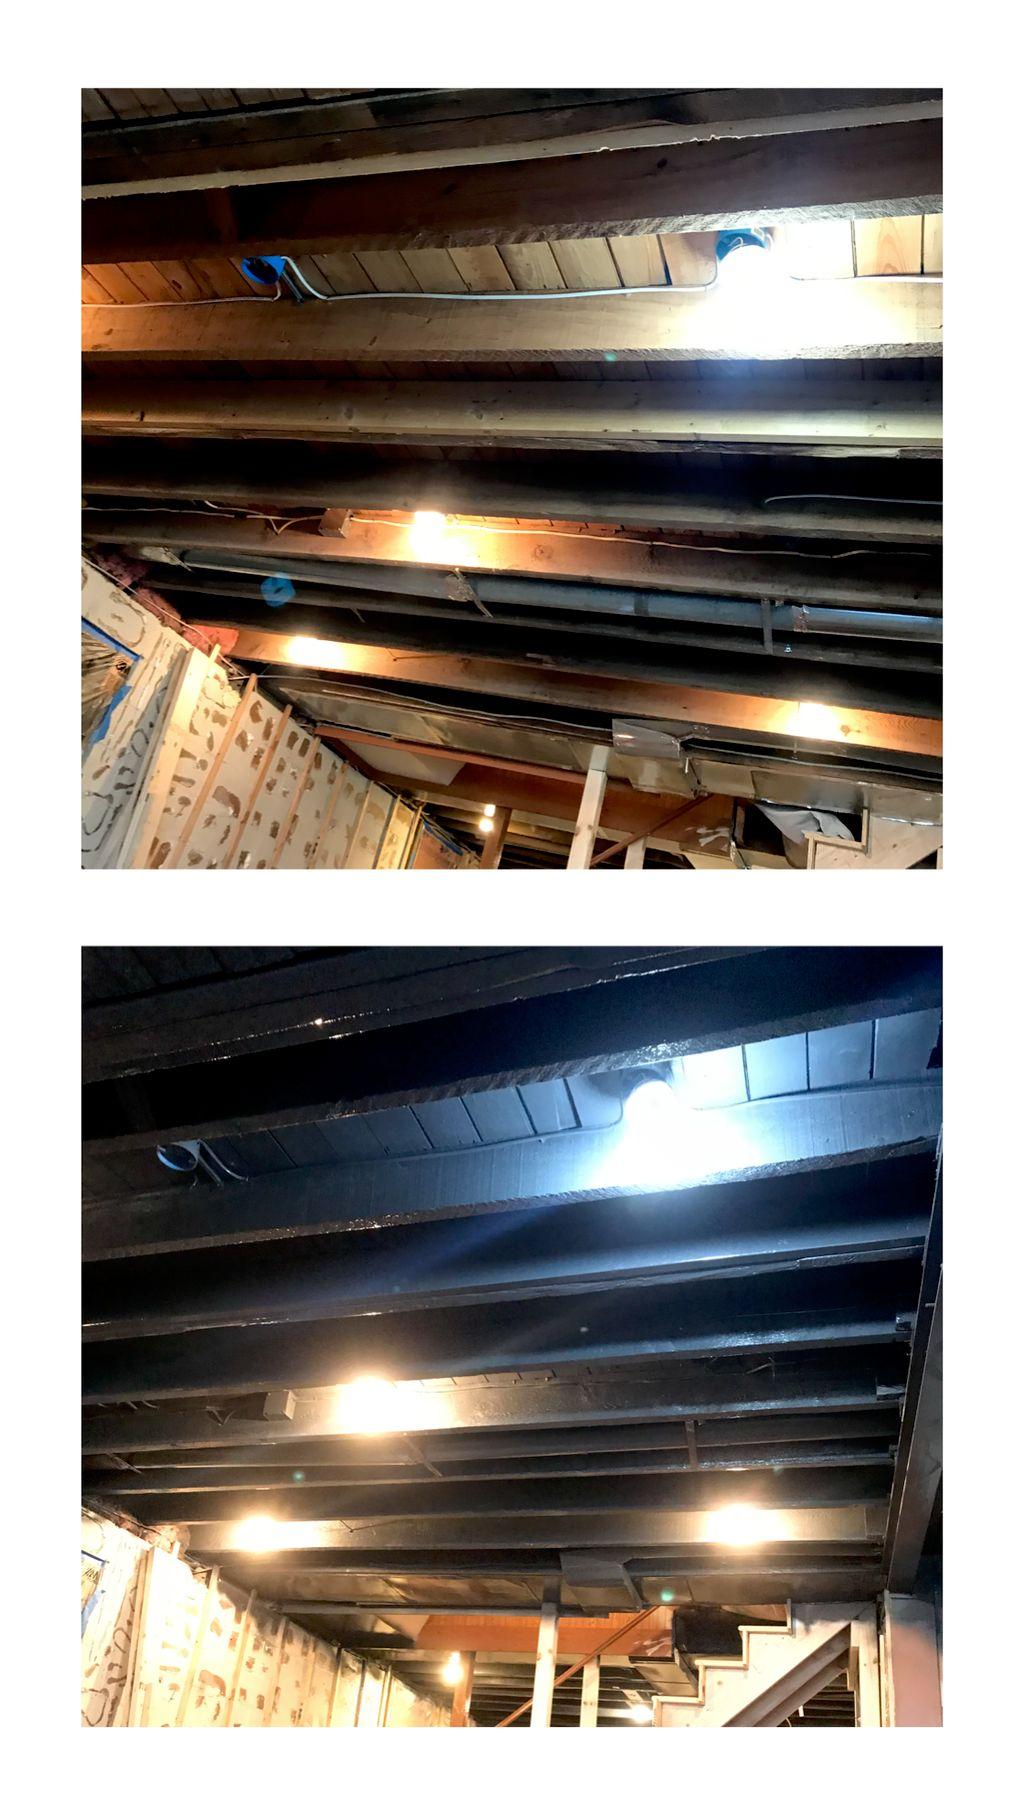 Basement Ceiling and floor joists